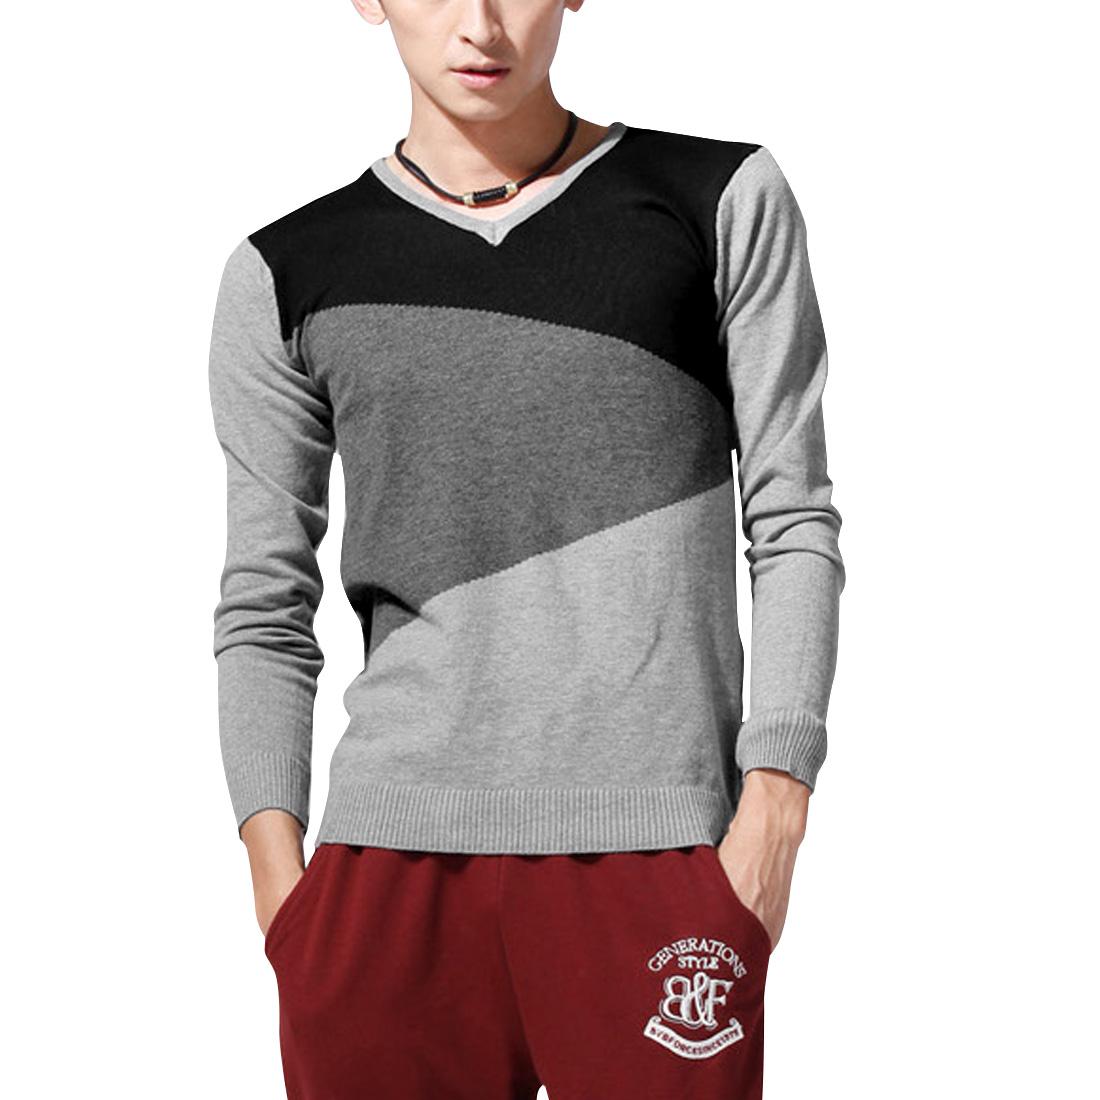 Men Pullover Long Sleeve Color Block Knitted Shirt Black Light Gray S